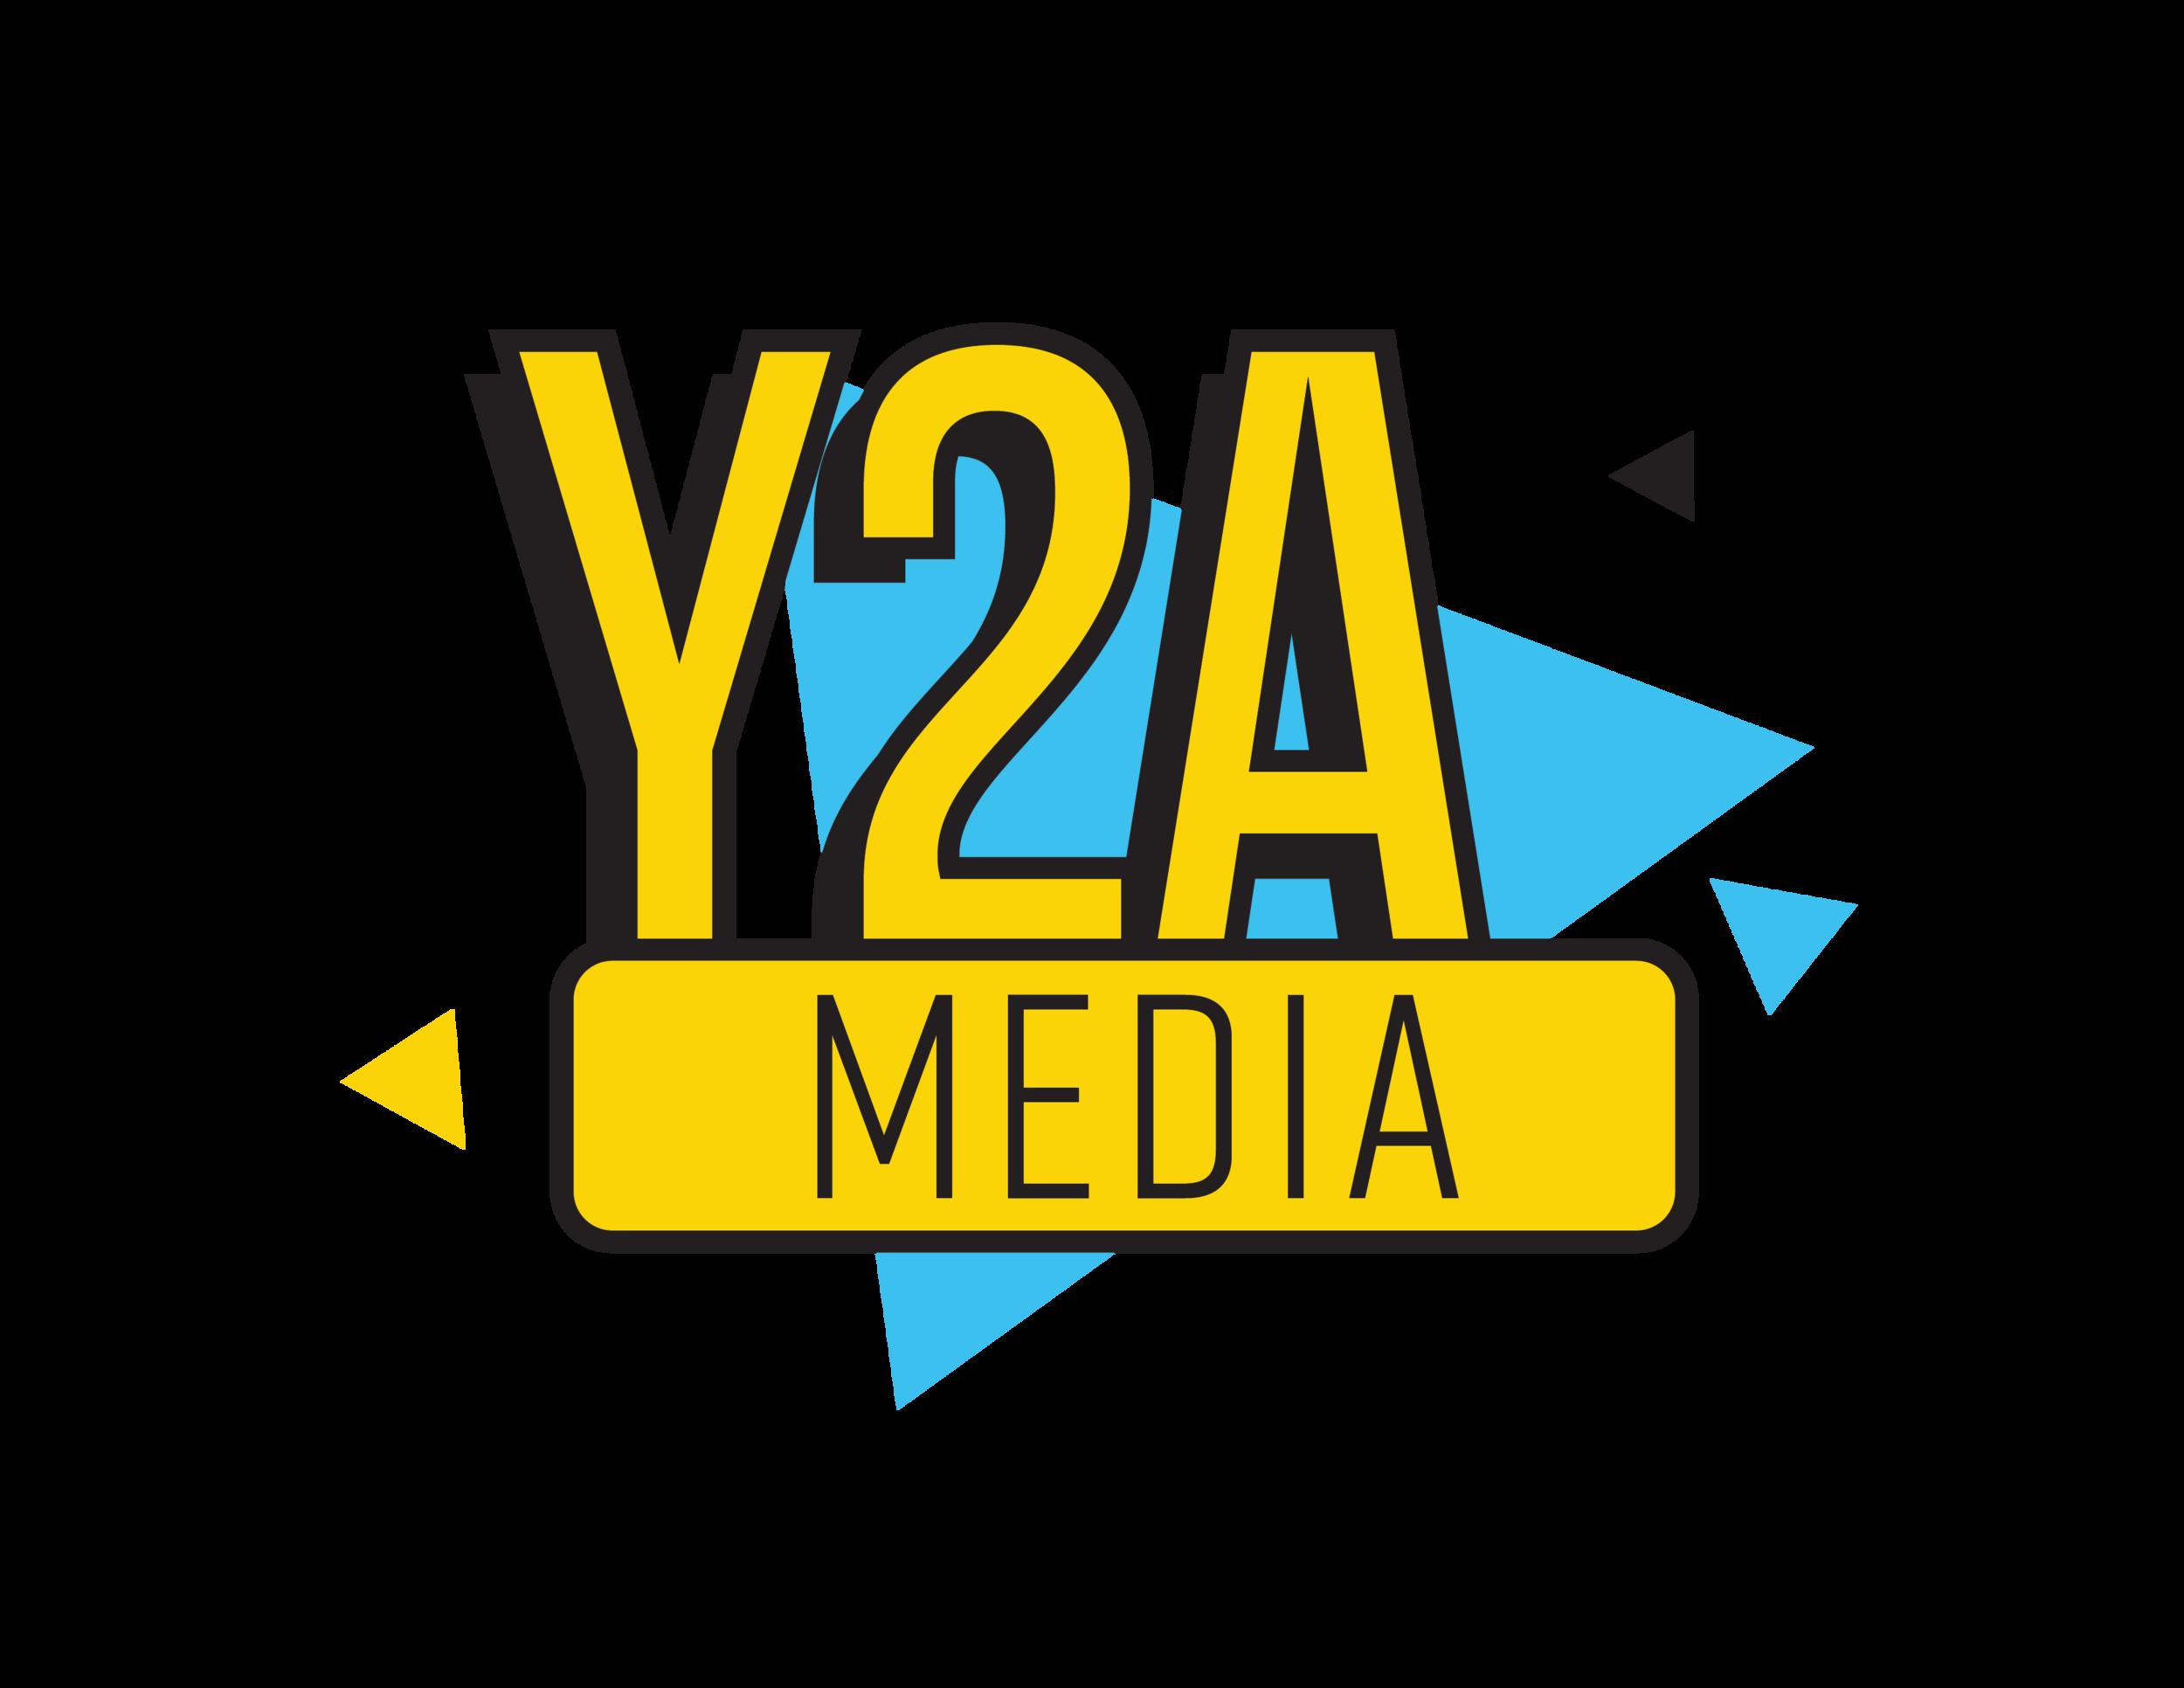 y2a_logo3-01.png